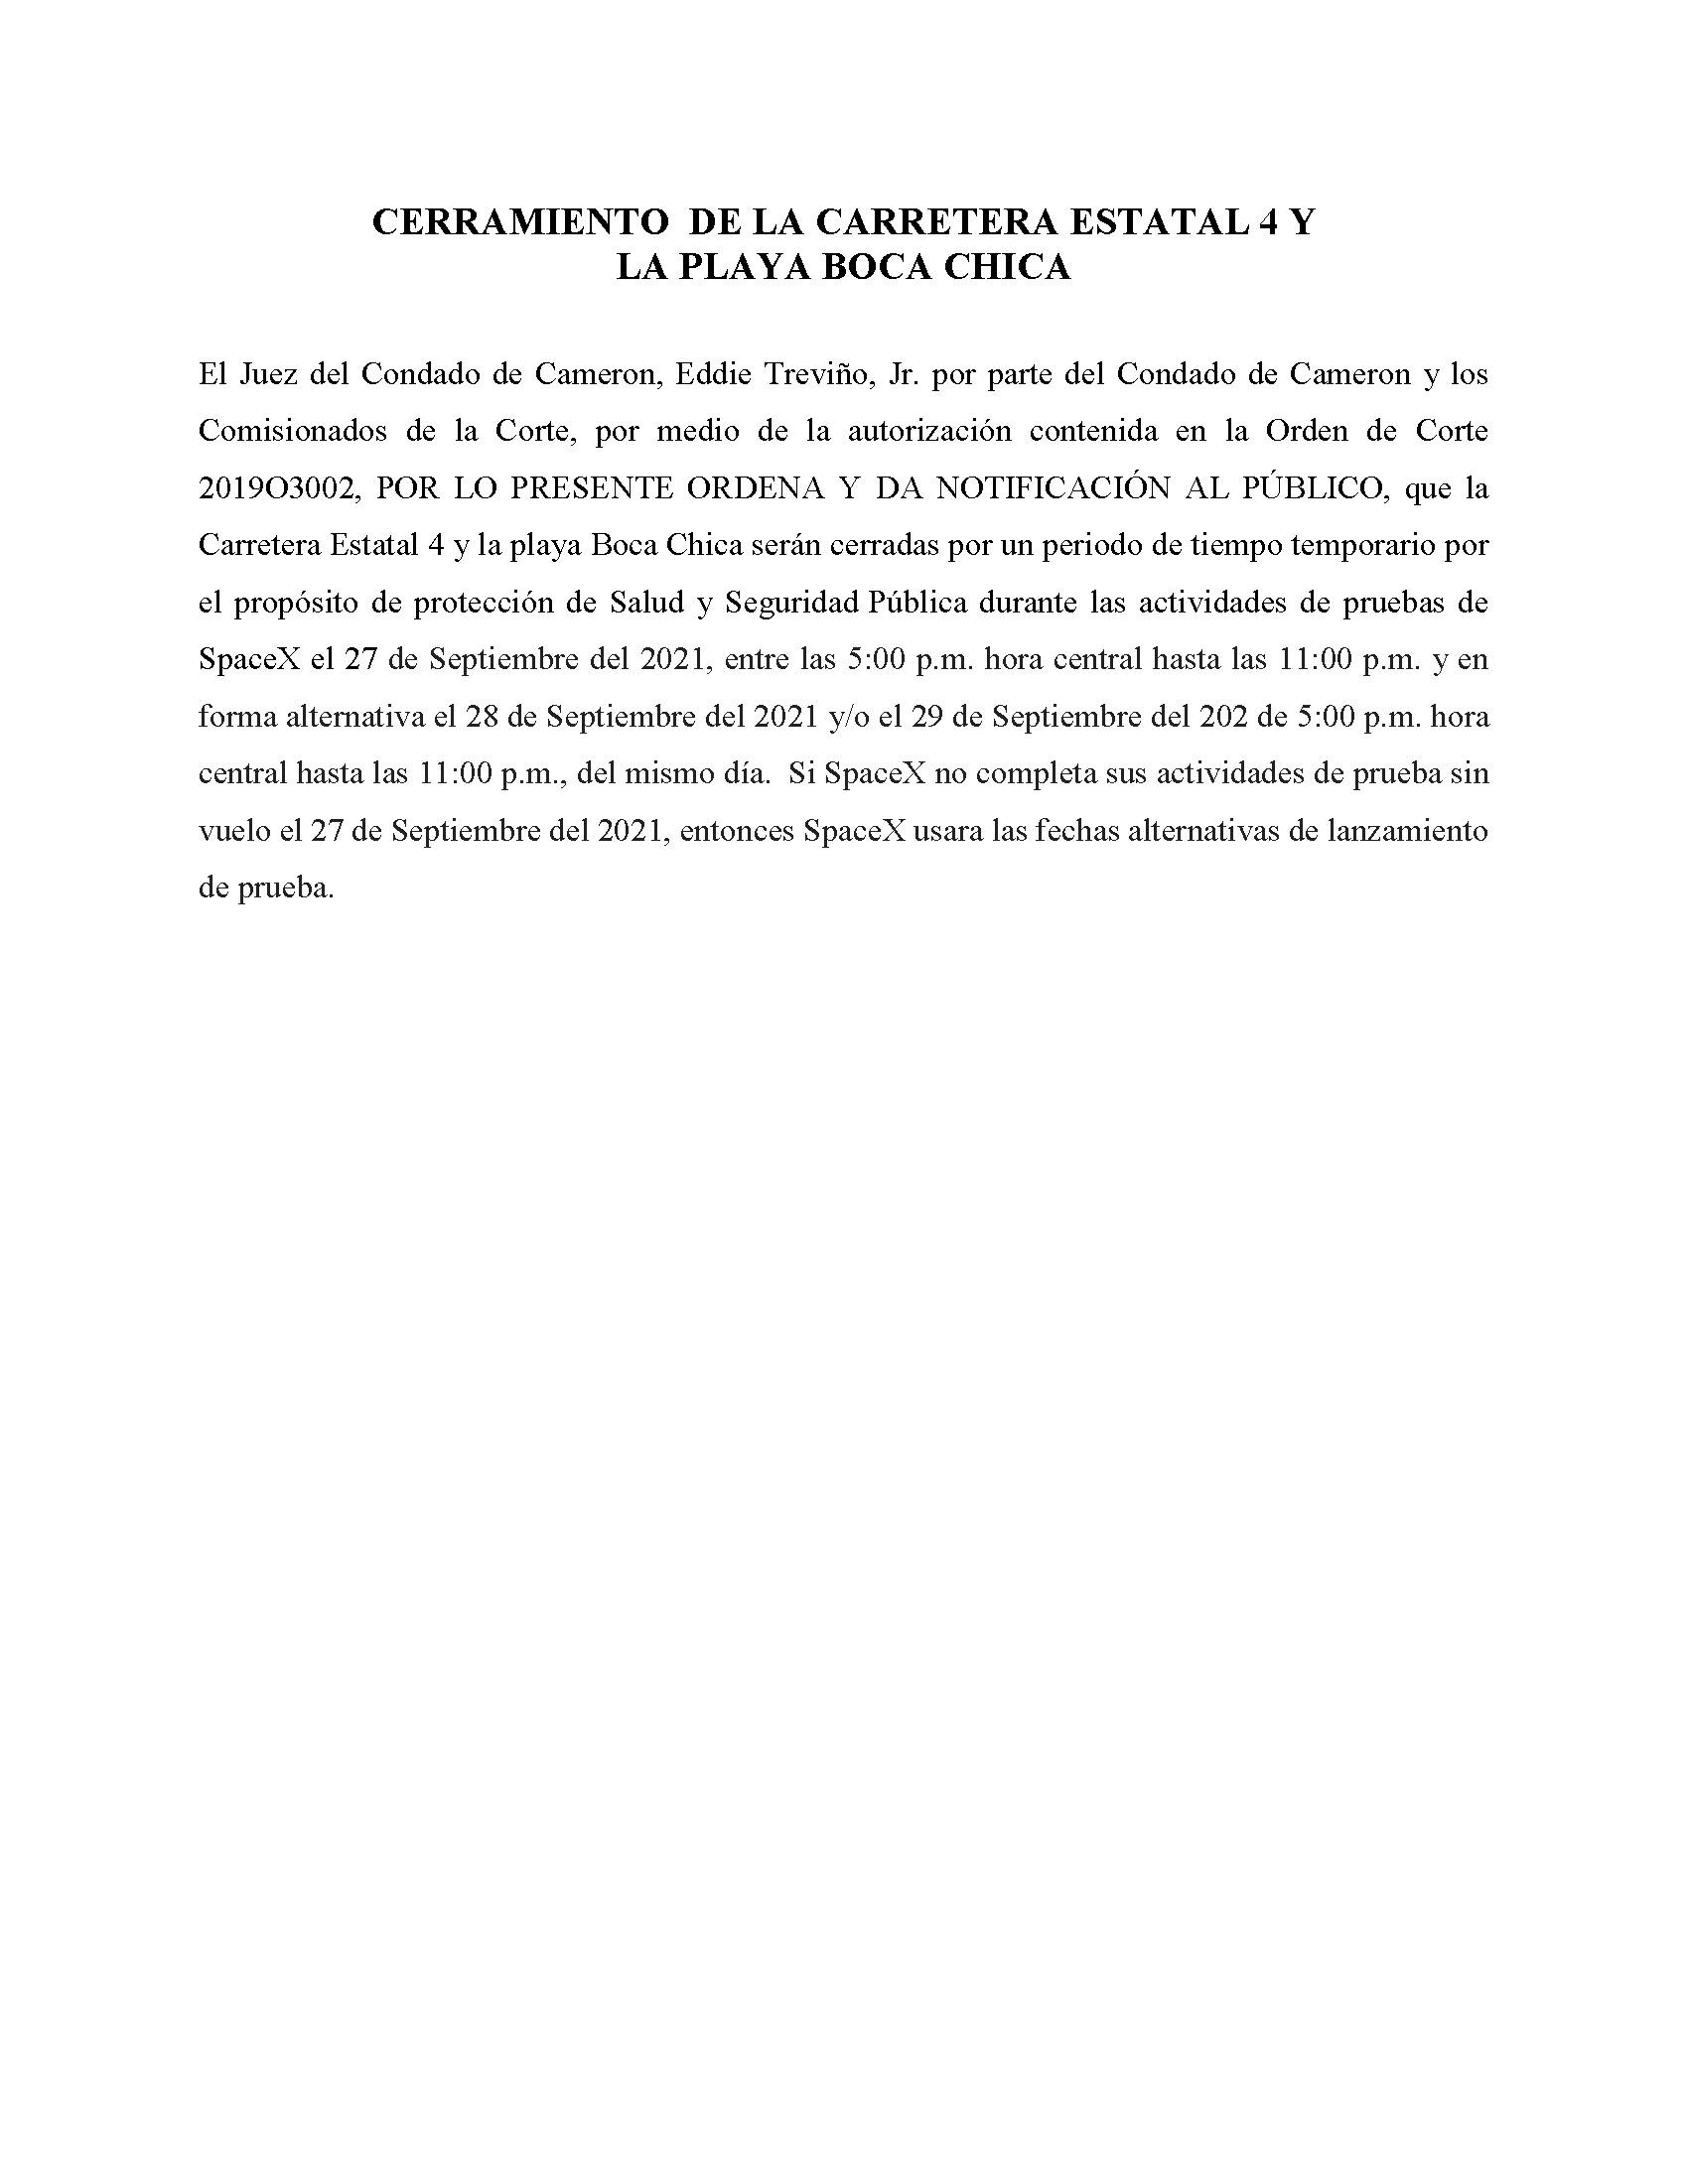 ORDER.CLOSURE OF HIGHWAY 4 Y LA PLAYA BOCA CHICA.SPANISH.09.27.2021